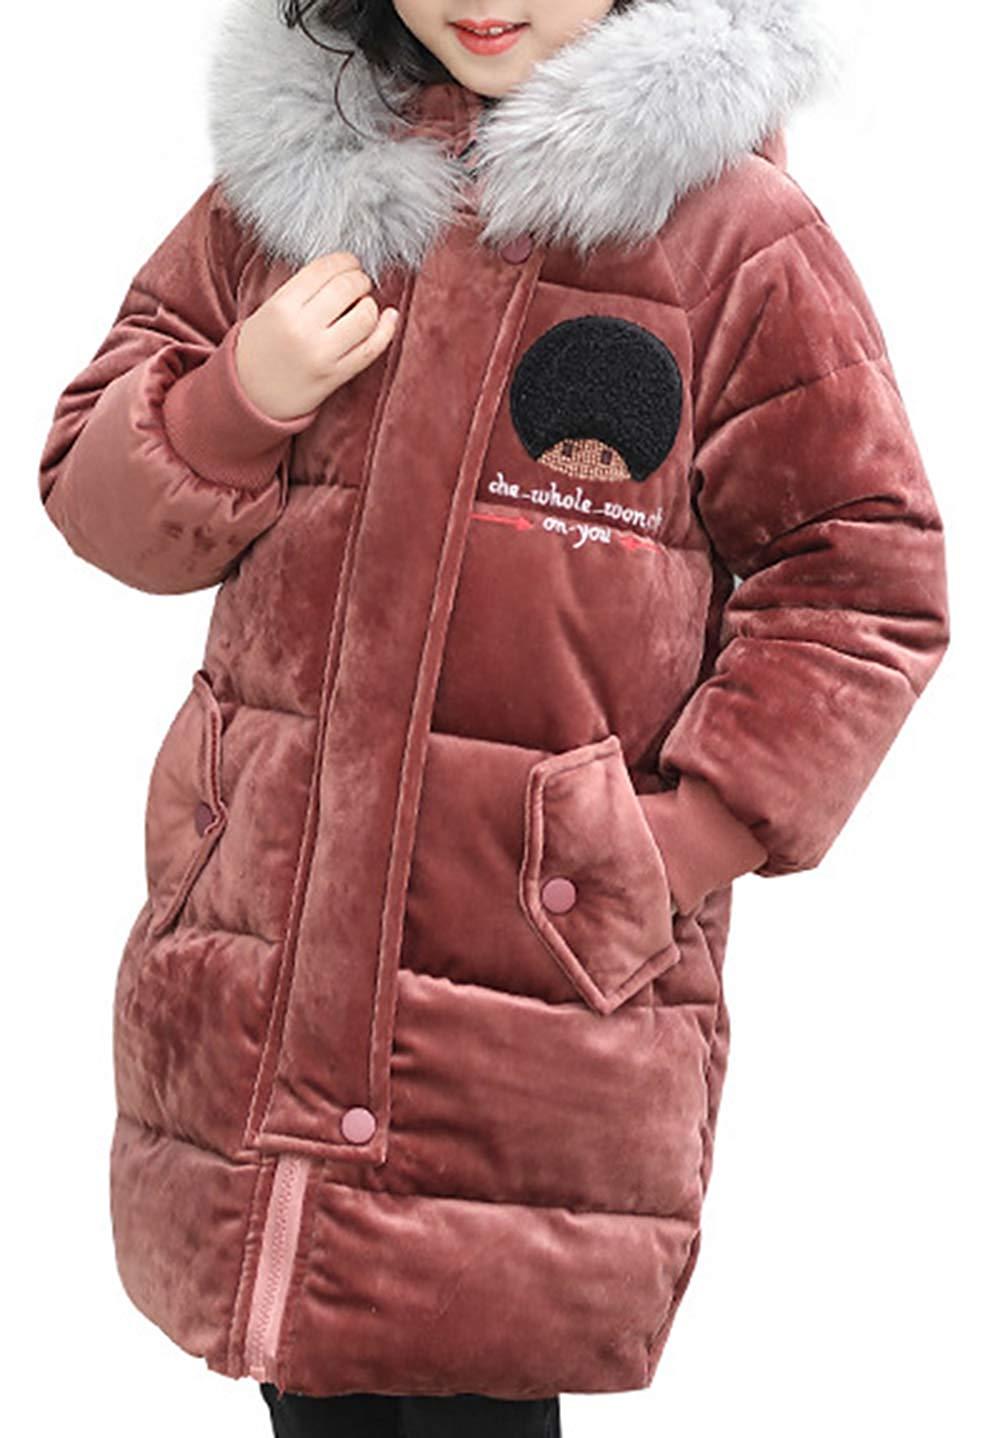 ZXFHZS Mens Classic Winter Thicken Down Jacket Outwear Faux Fur Hooded Puffer Jacket